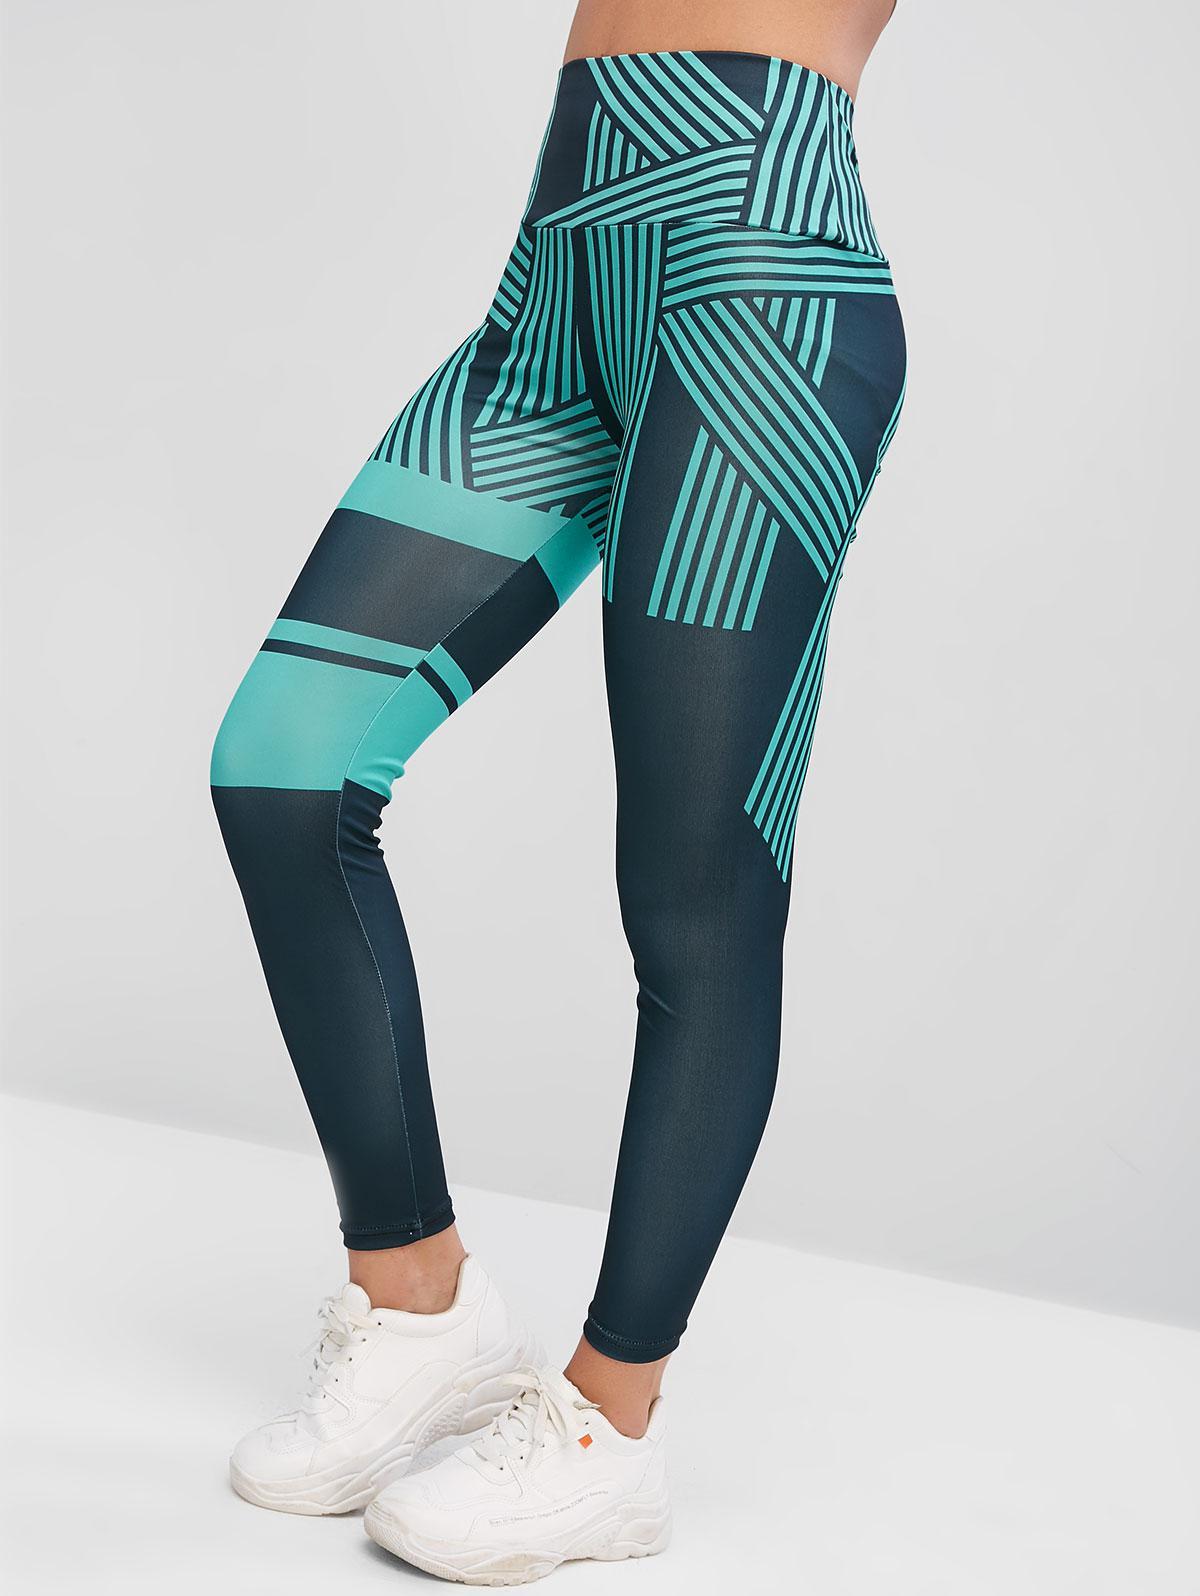 High Waisted Striped Skinny Leggings, Light sea green